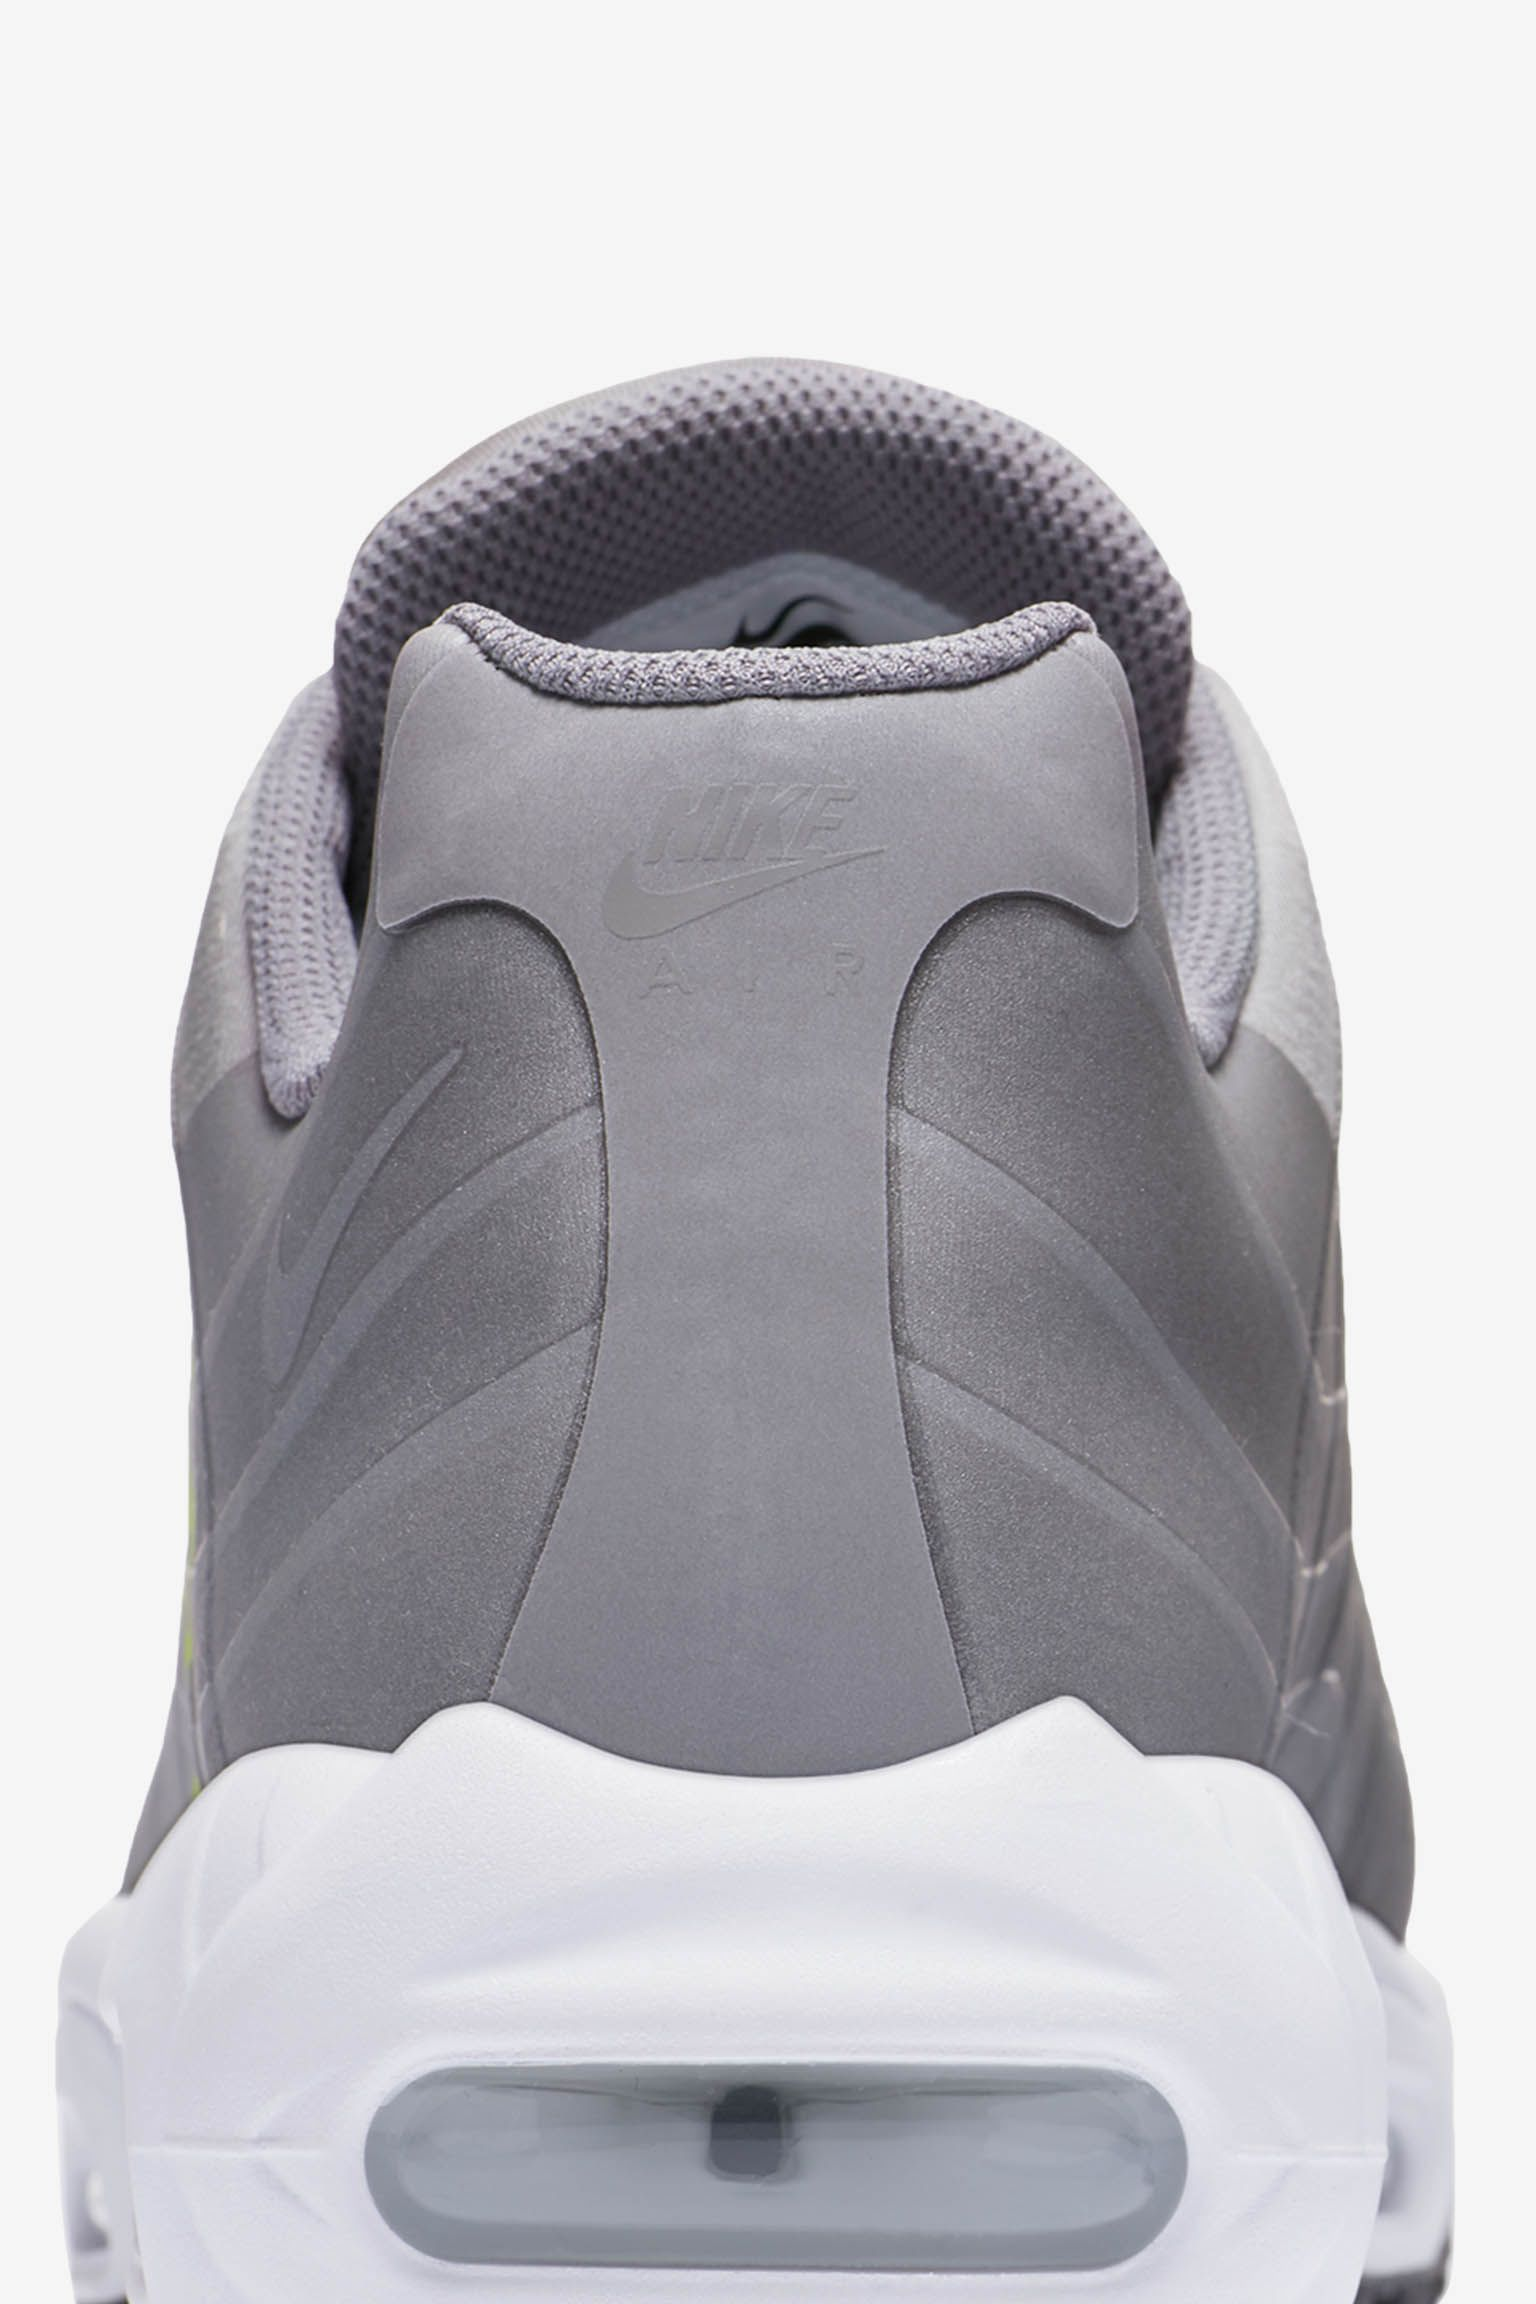 Nike Air Max 95 Big Logo 'Dust & Volt' Release Date